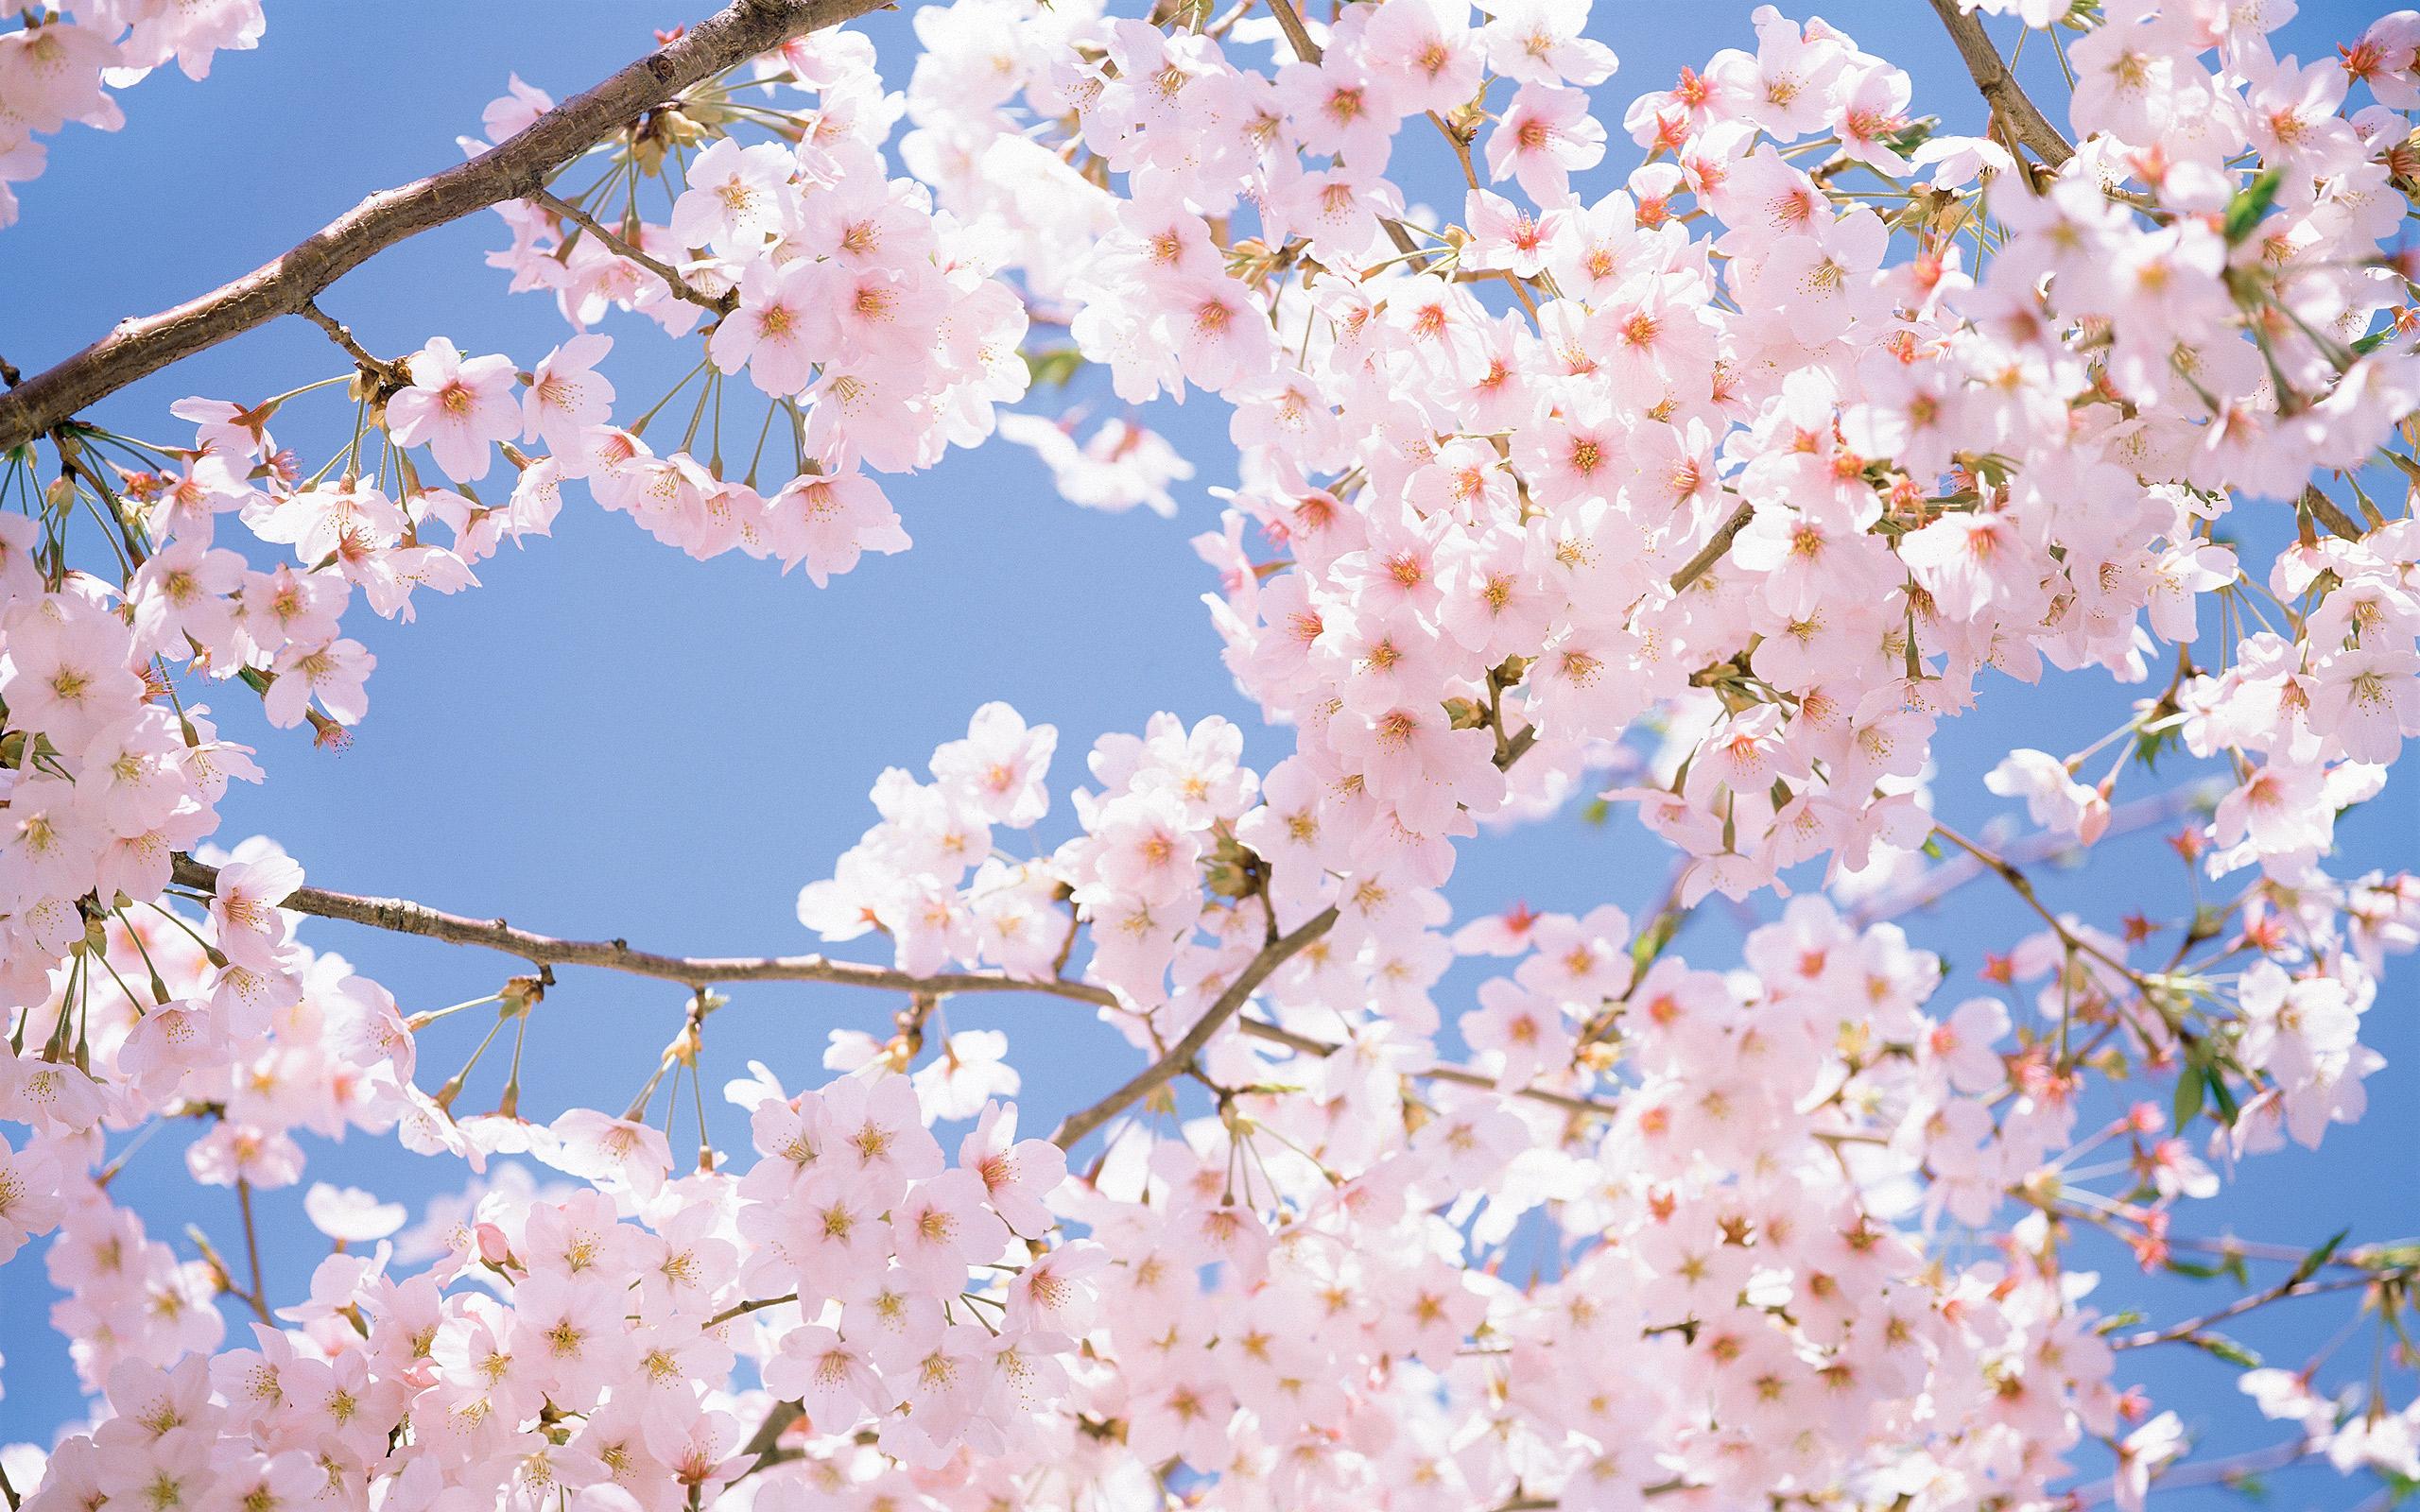 2560x1600 Stunning Cherry Blossom